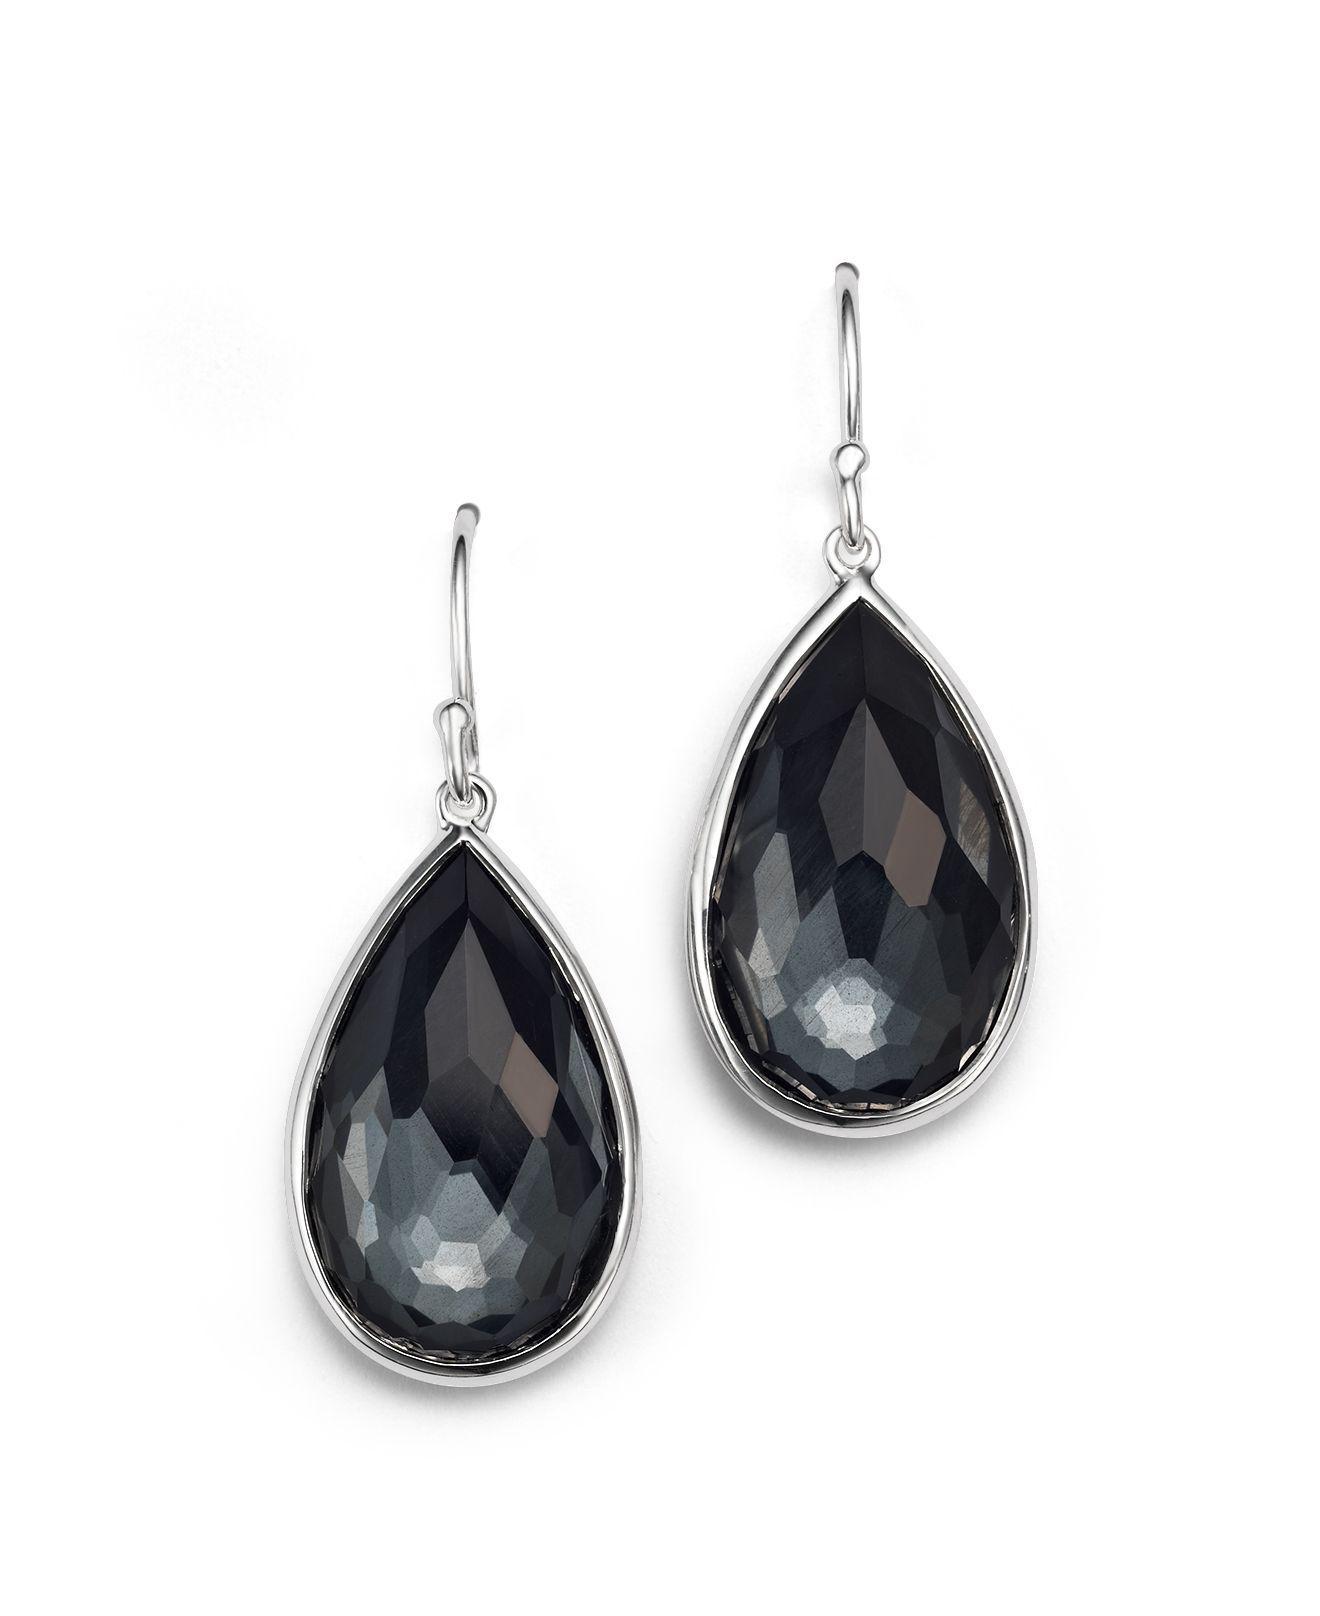 Ippolita Rock Candy Two-Stone Earrings in Onyx and Hematite SFDyg5MOK